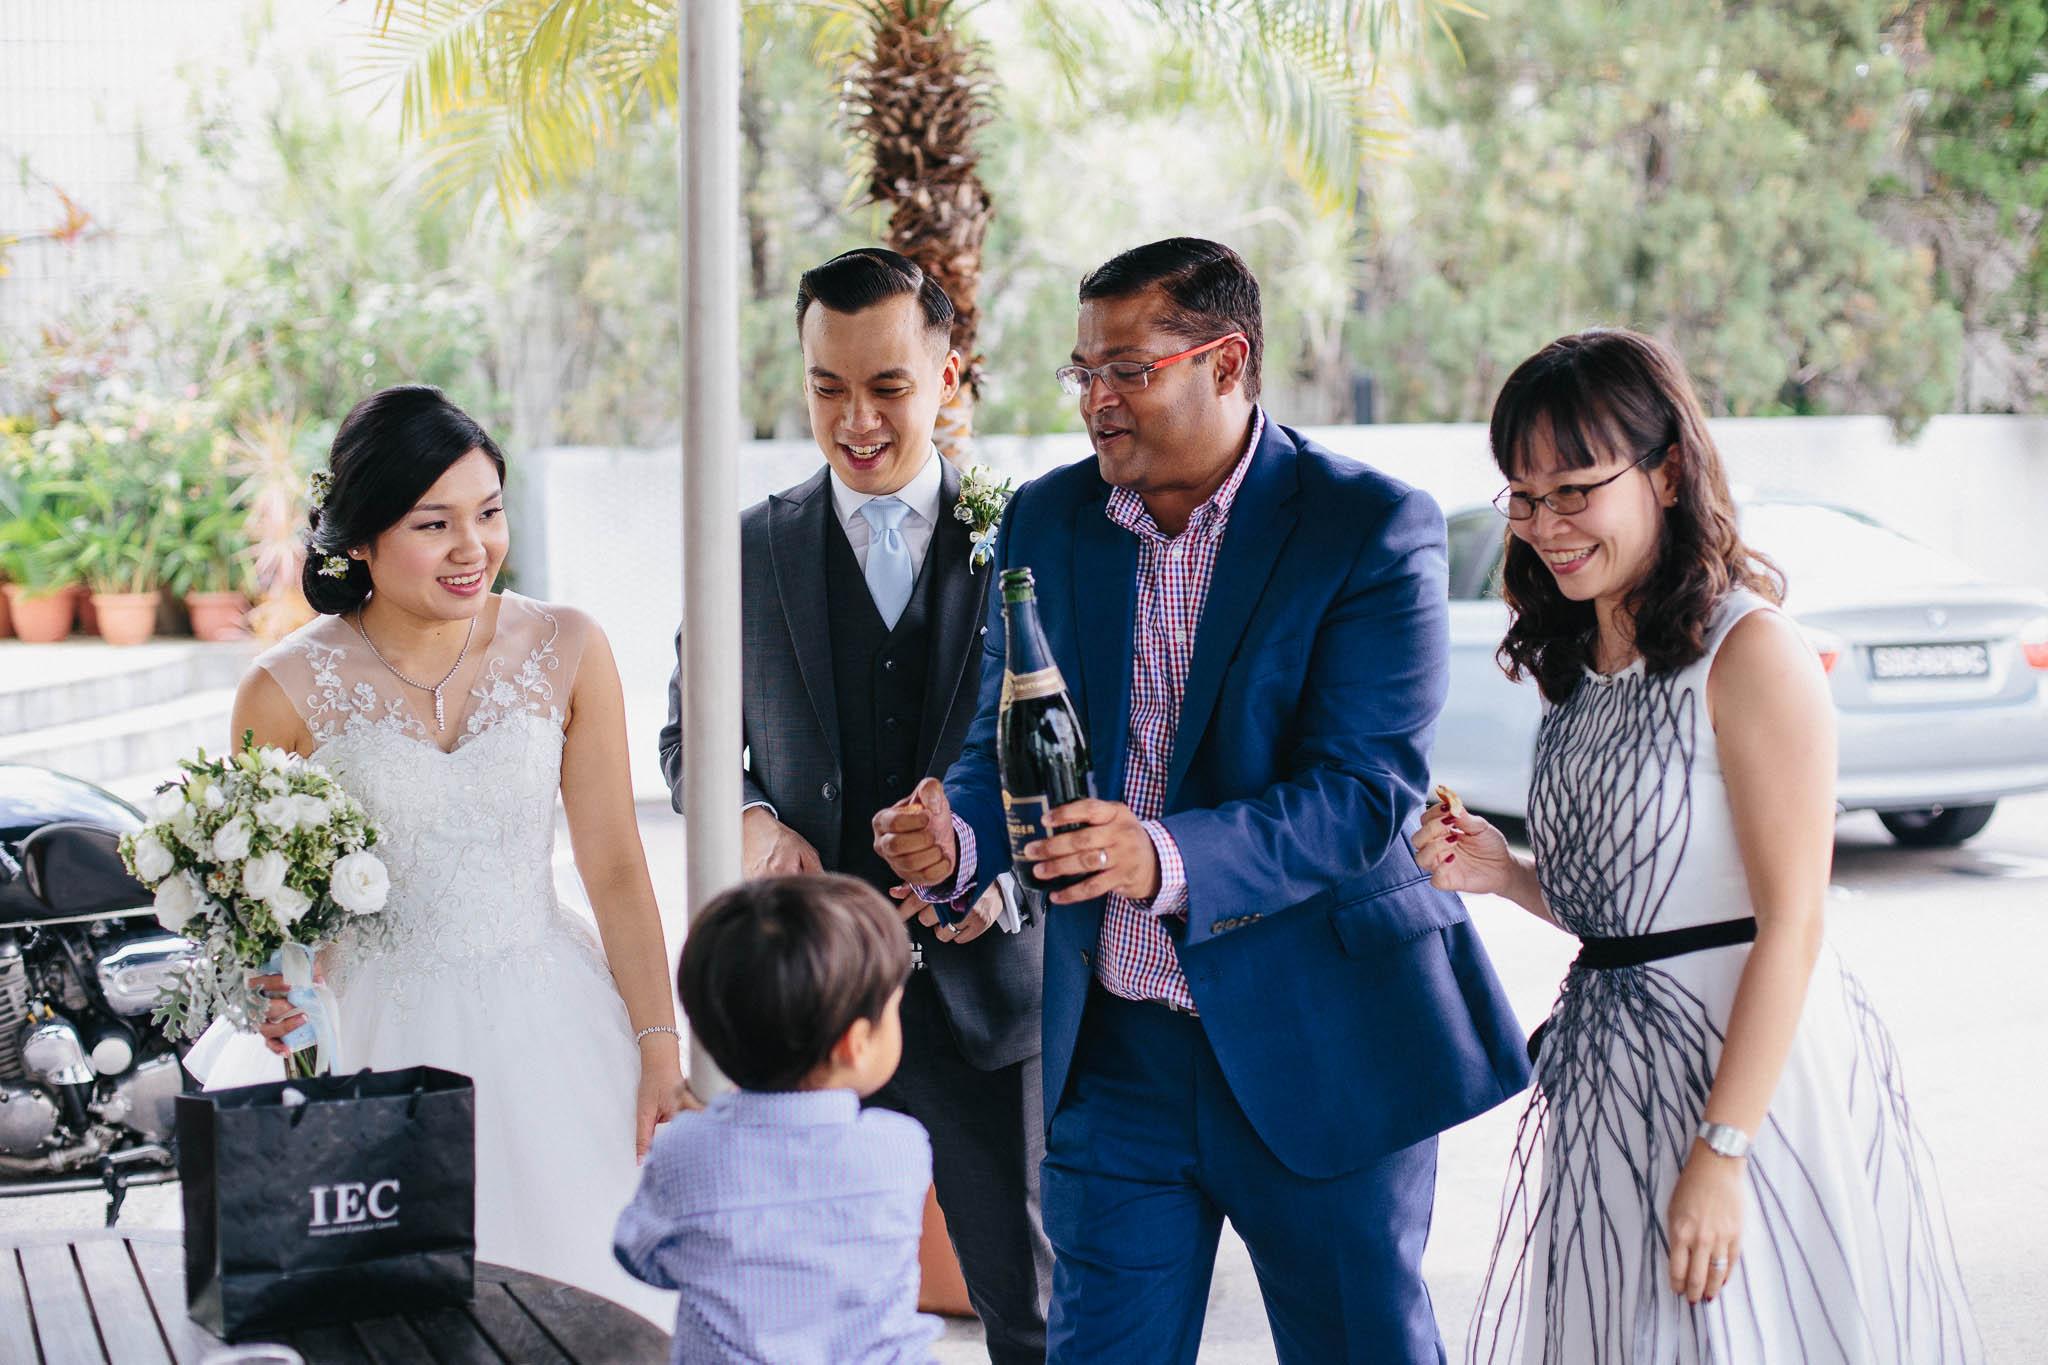 singapore-wedding-photographer-malay-indian-pre-wedding-travel-wmt-2015-jeremy-larissa-60.jpg